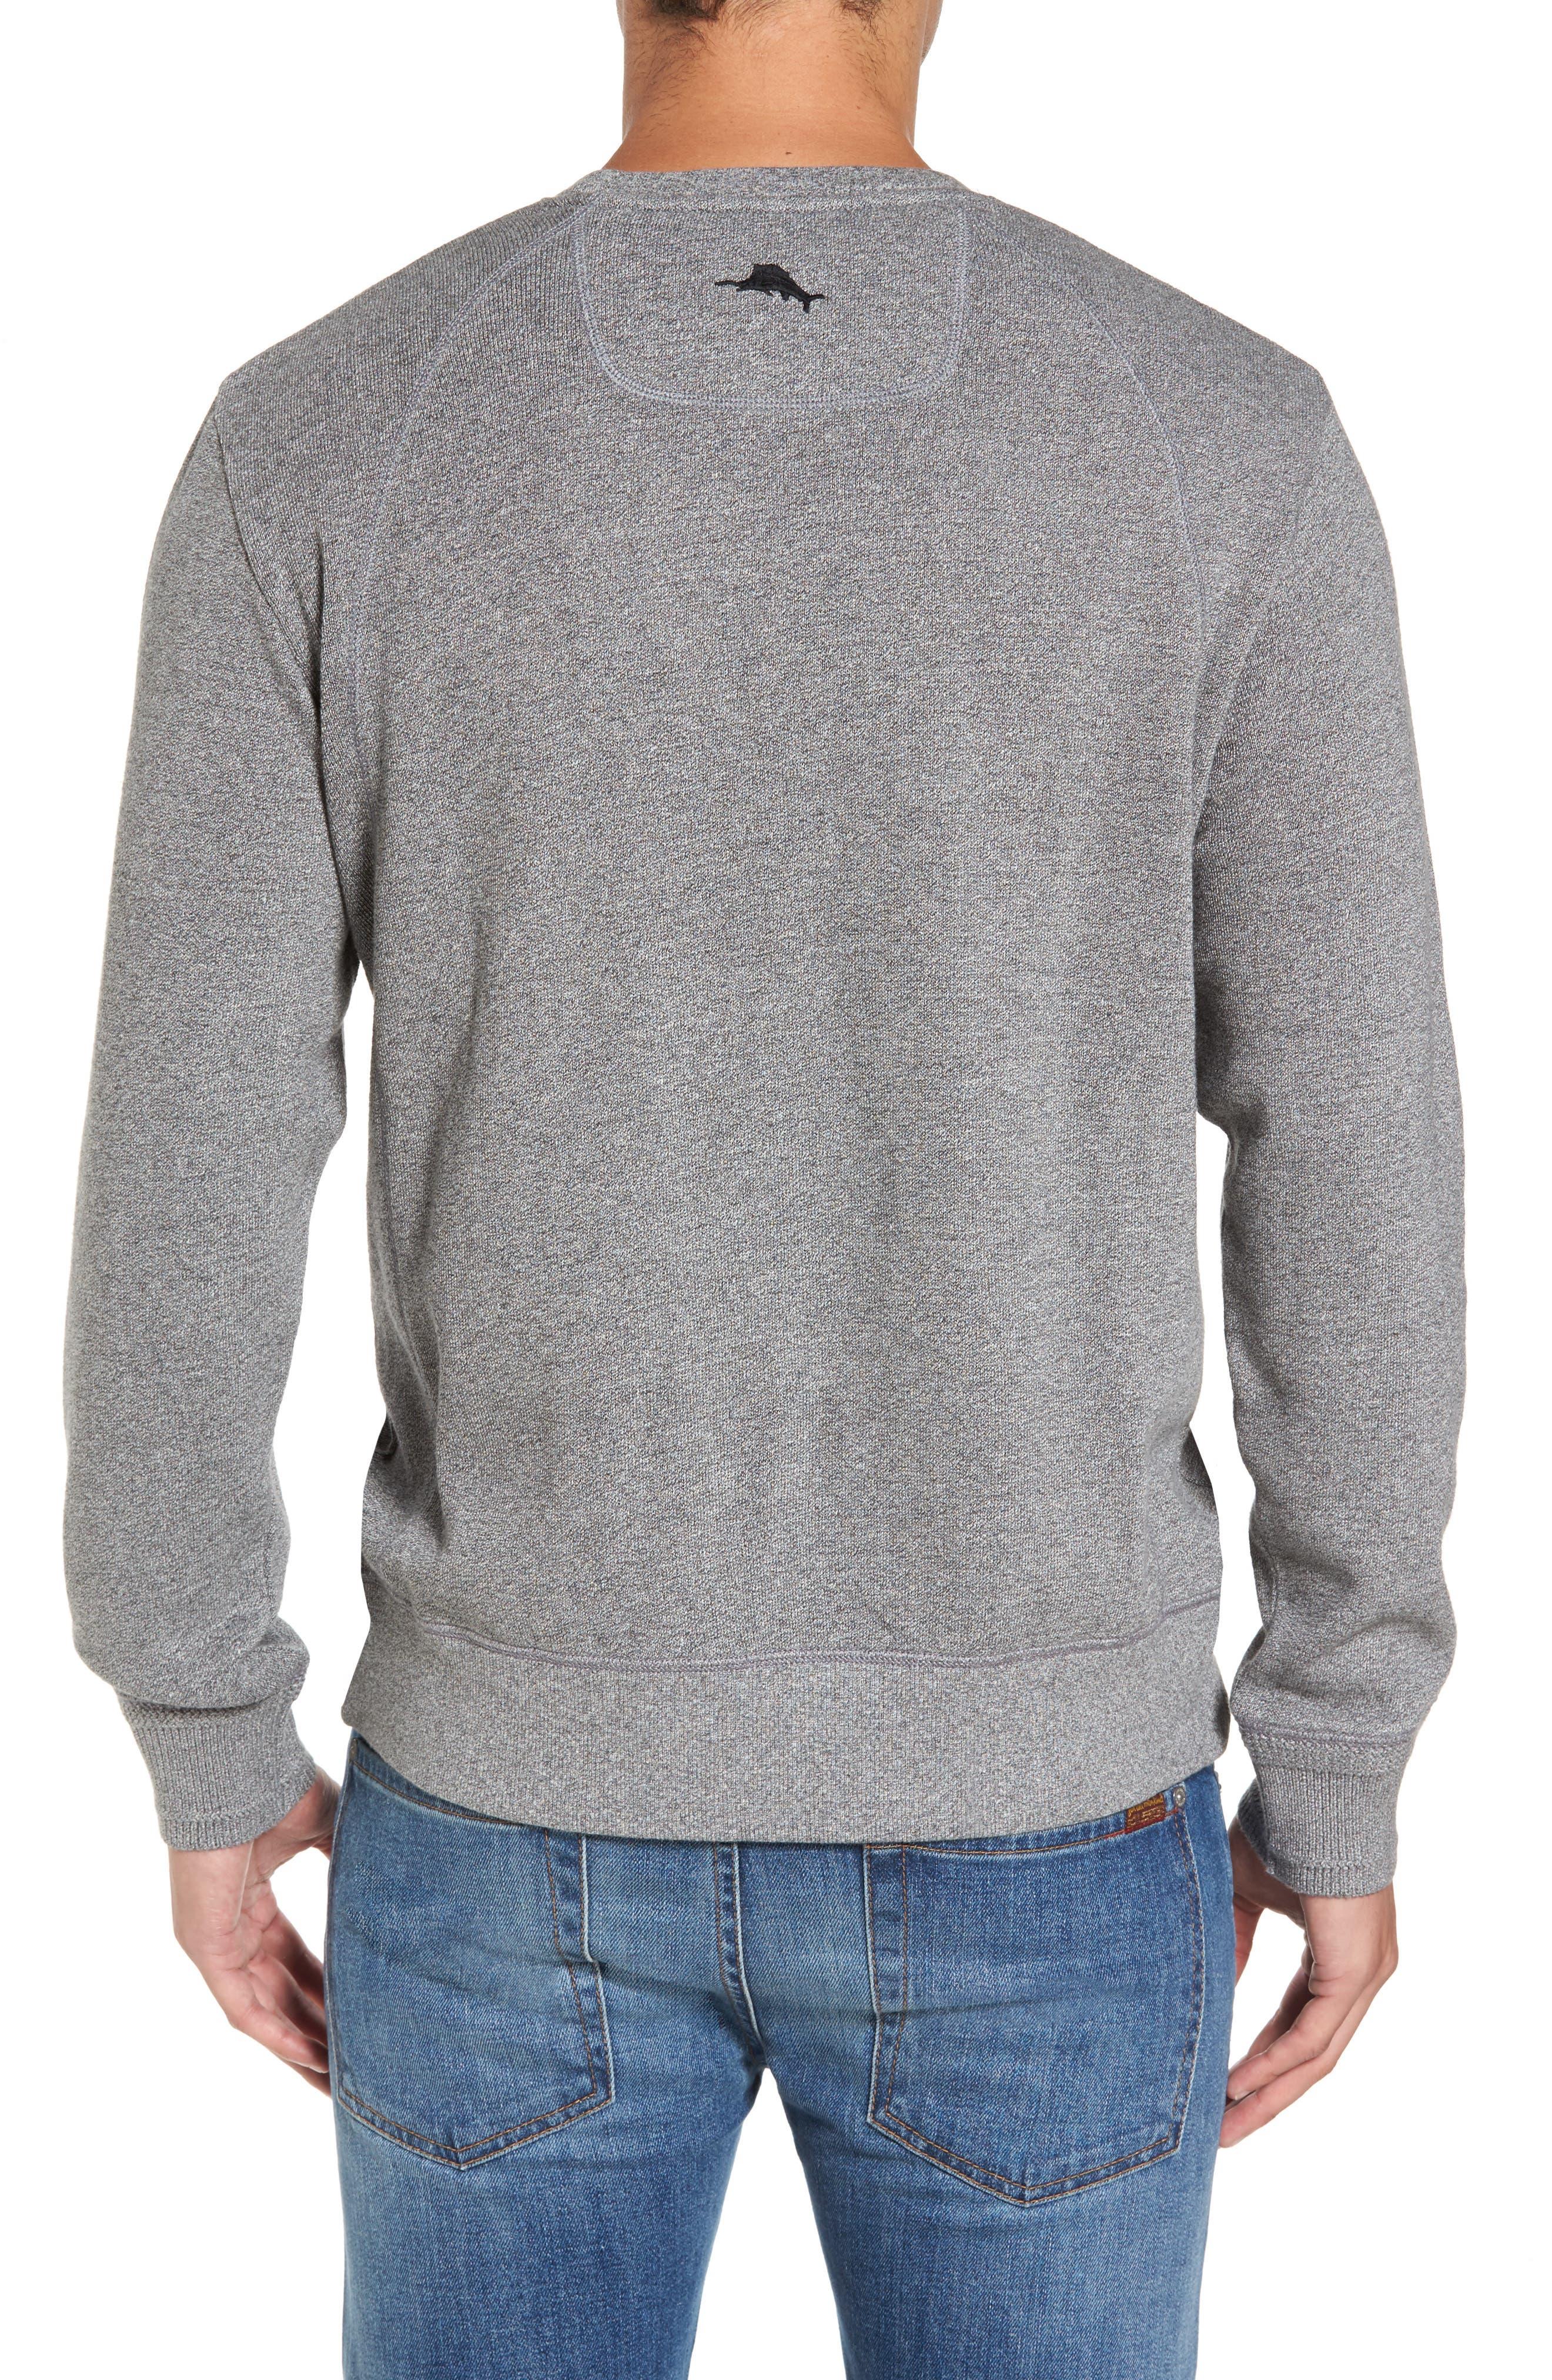 NFL Stitch of Liberty Embroidered Crewneck Sweatshirt,                             Alternate thumbnail 55, color,